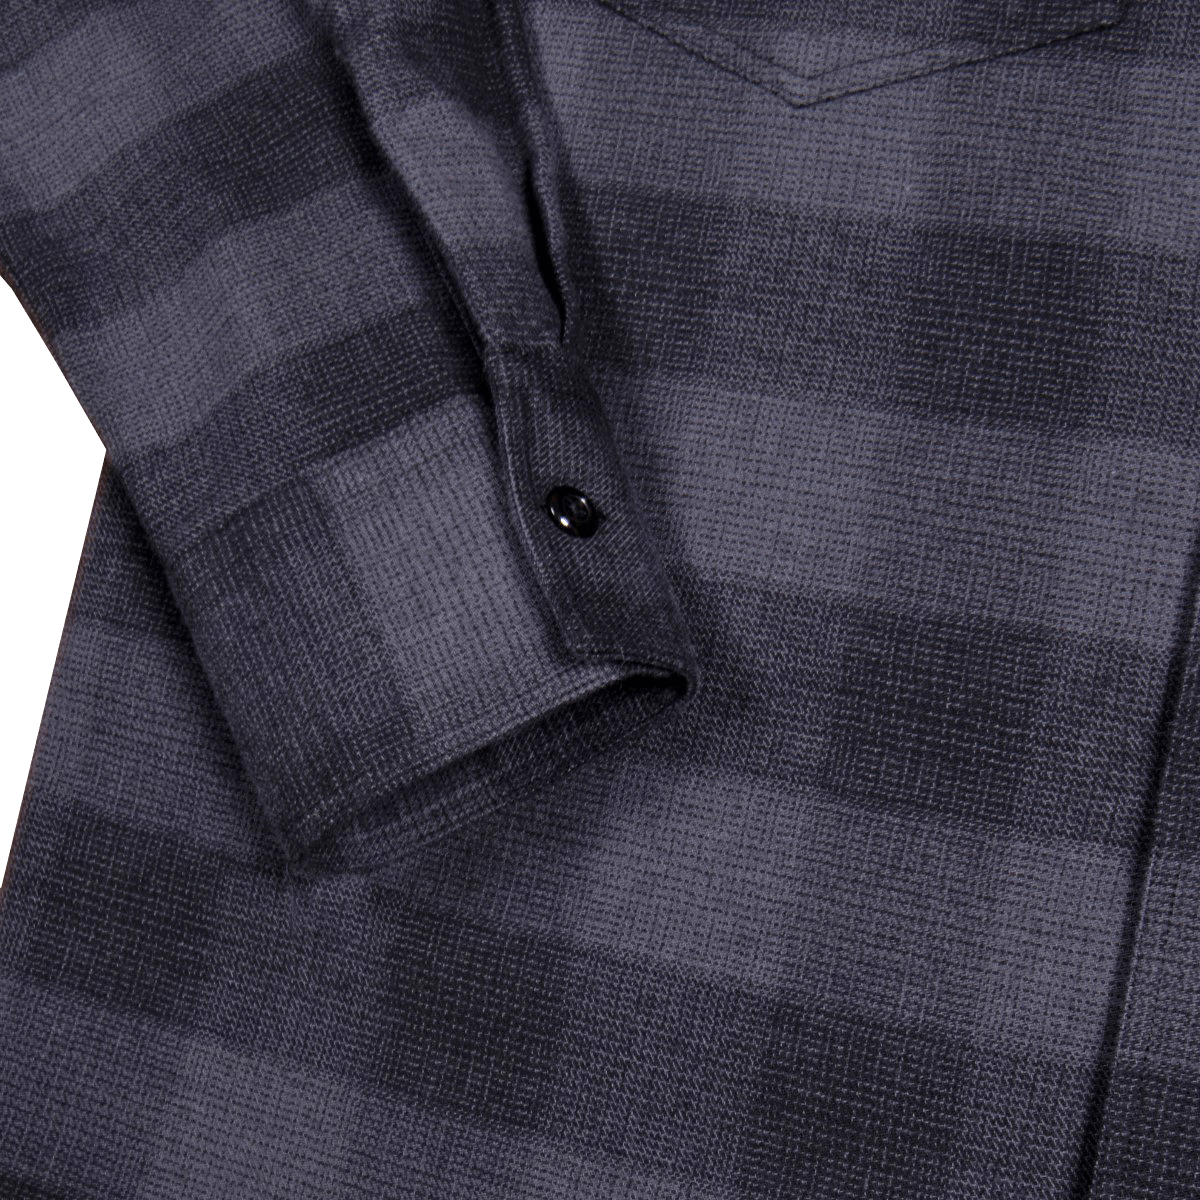 Pike Brothers 1937 Roamer Shirt Leeroy Grey